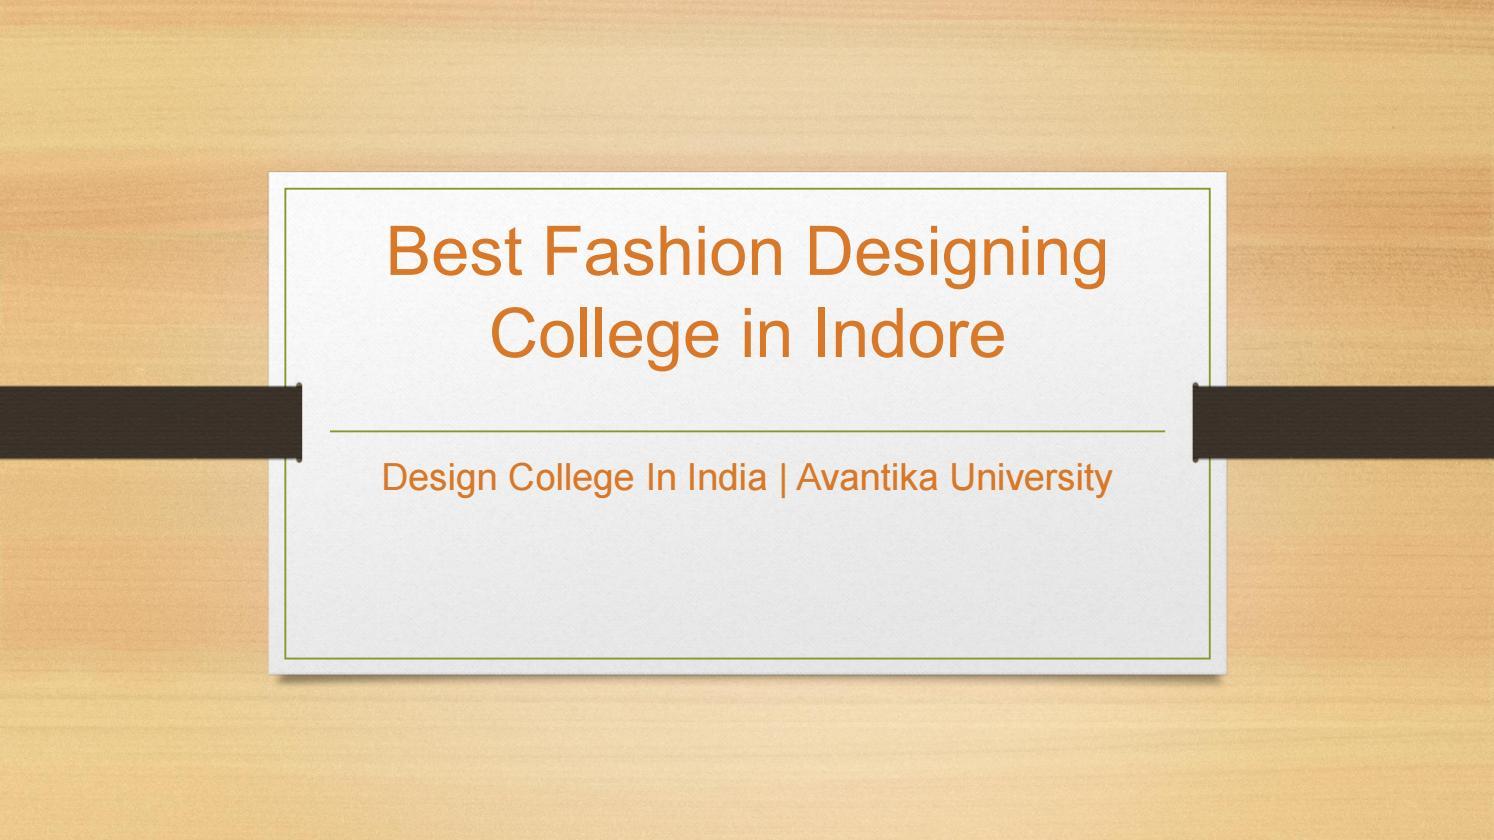 Best Fashion Designing College In Indore Avantika University By Avantika University Issuu